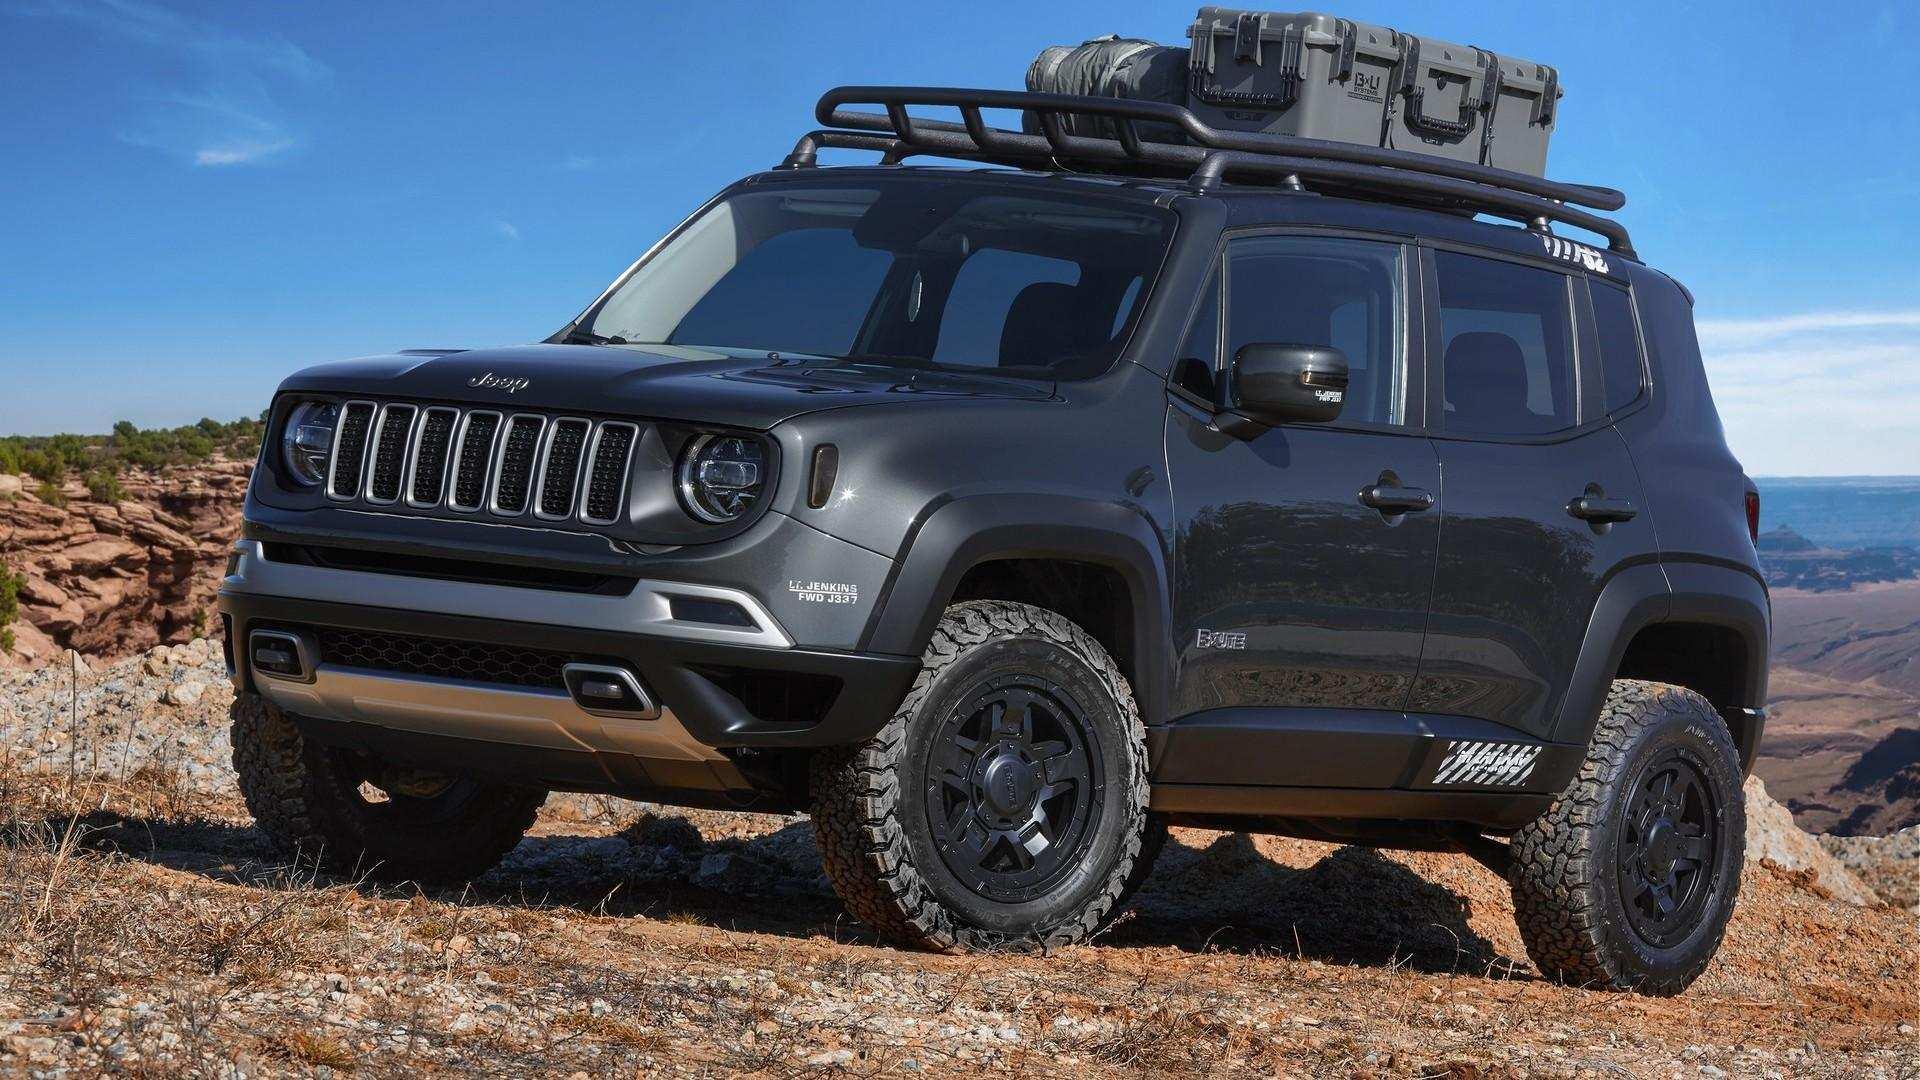 51 The Jeep Nuovi Modelli 2020 Speed Test by Jeep Nuovi Modelli 2020